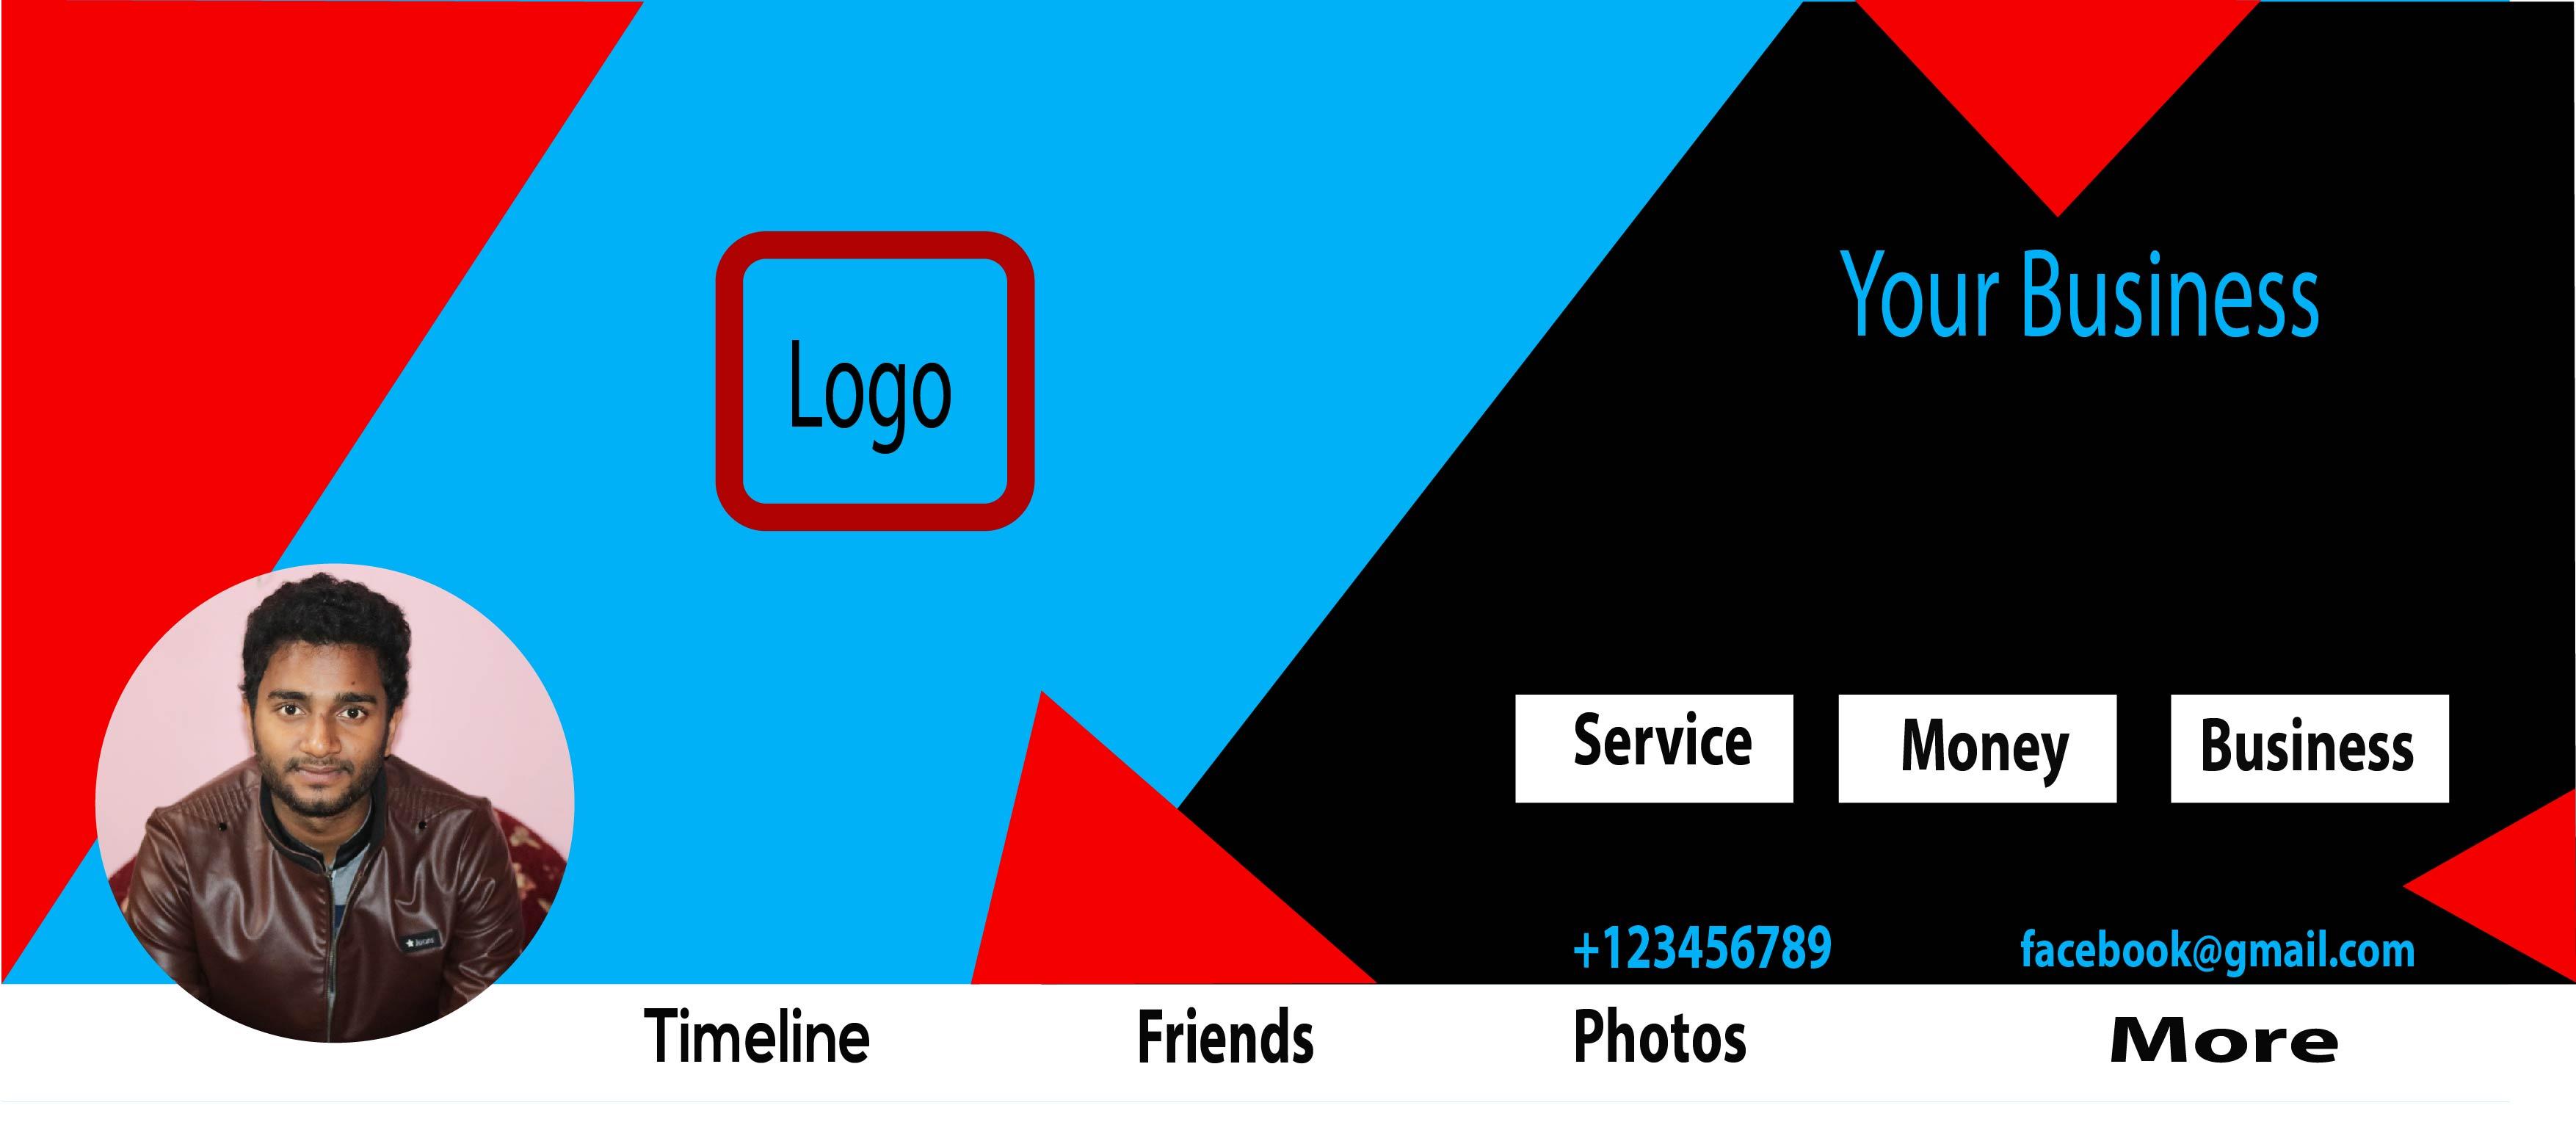 I will design Facebook cover photo or social media design